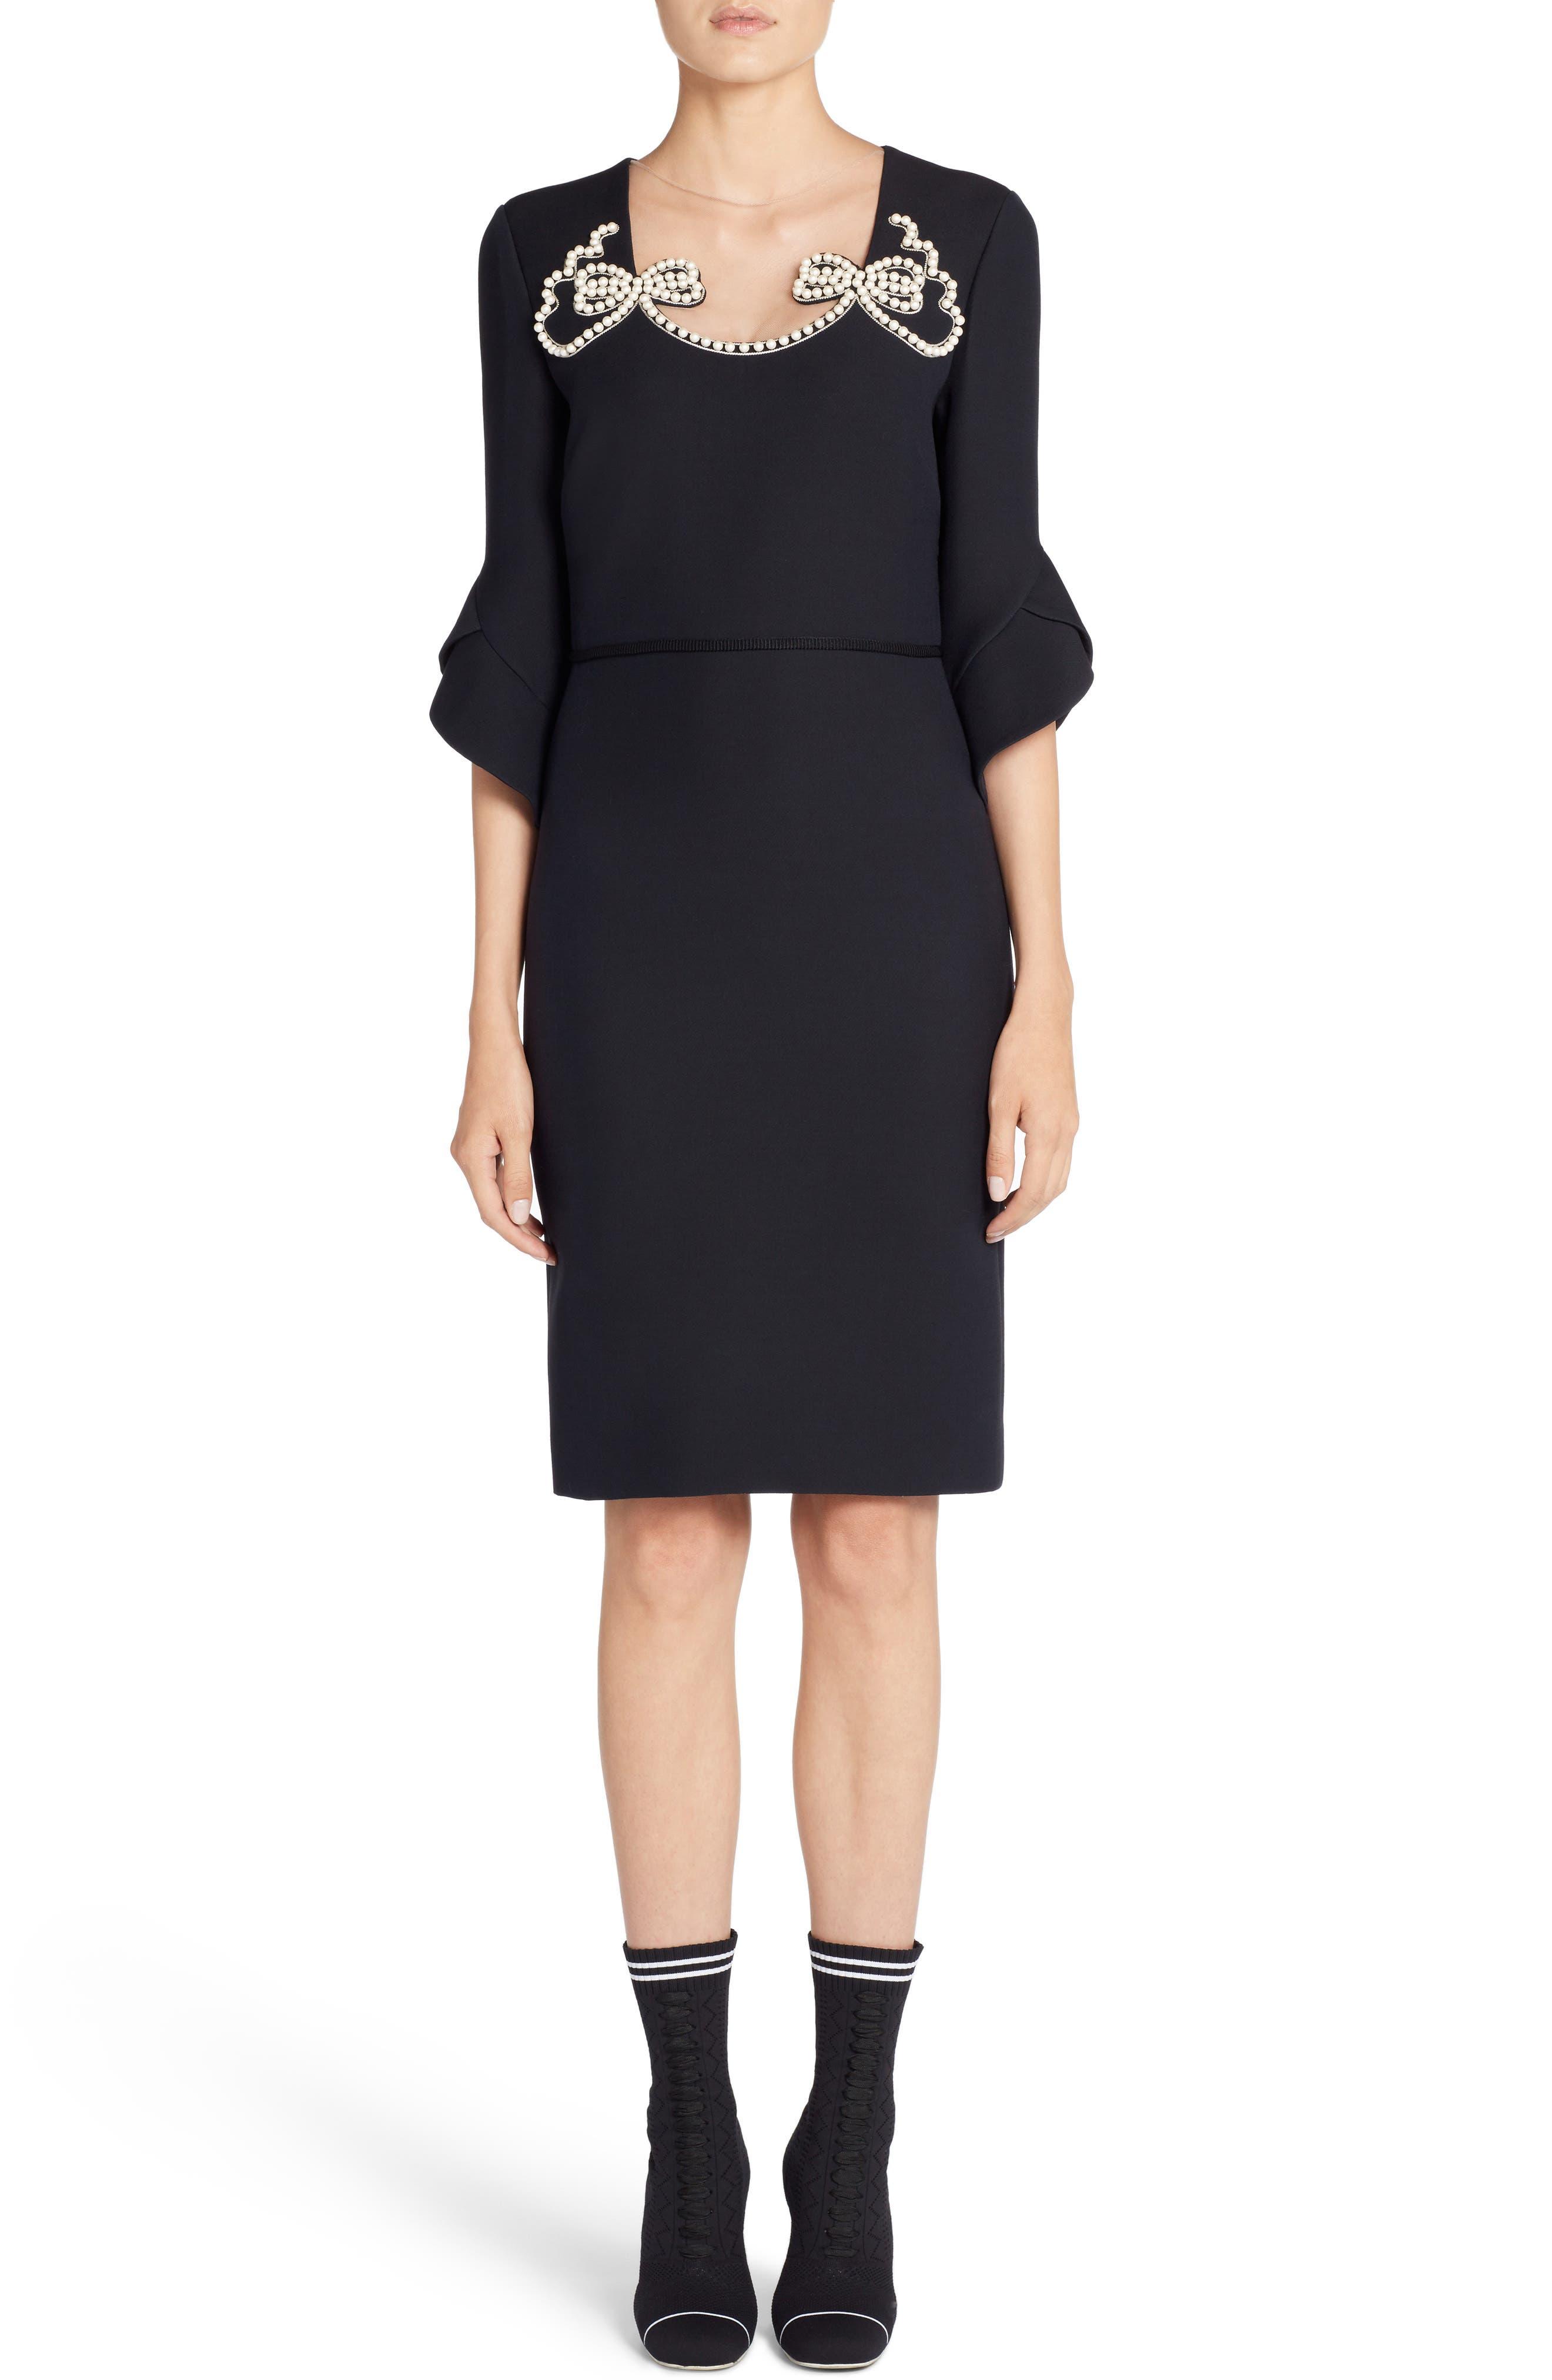 Alternate Image 1 Selected - Fendi Embellished Wool & Silk Gazar Dress